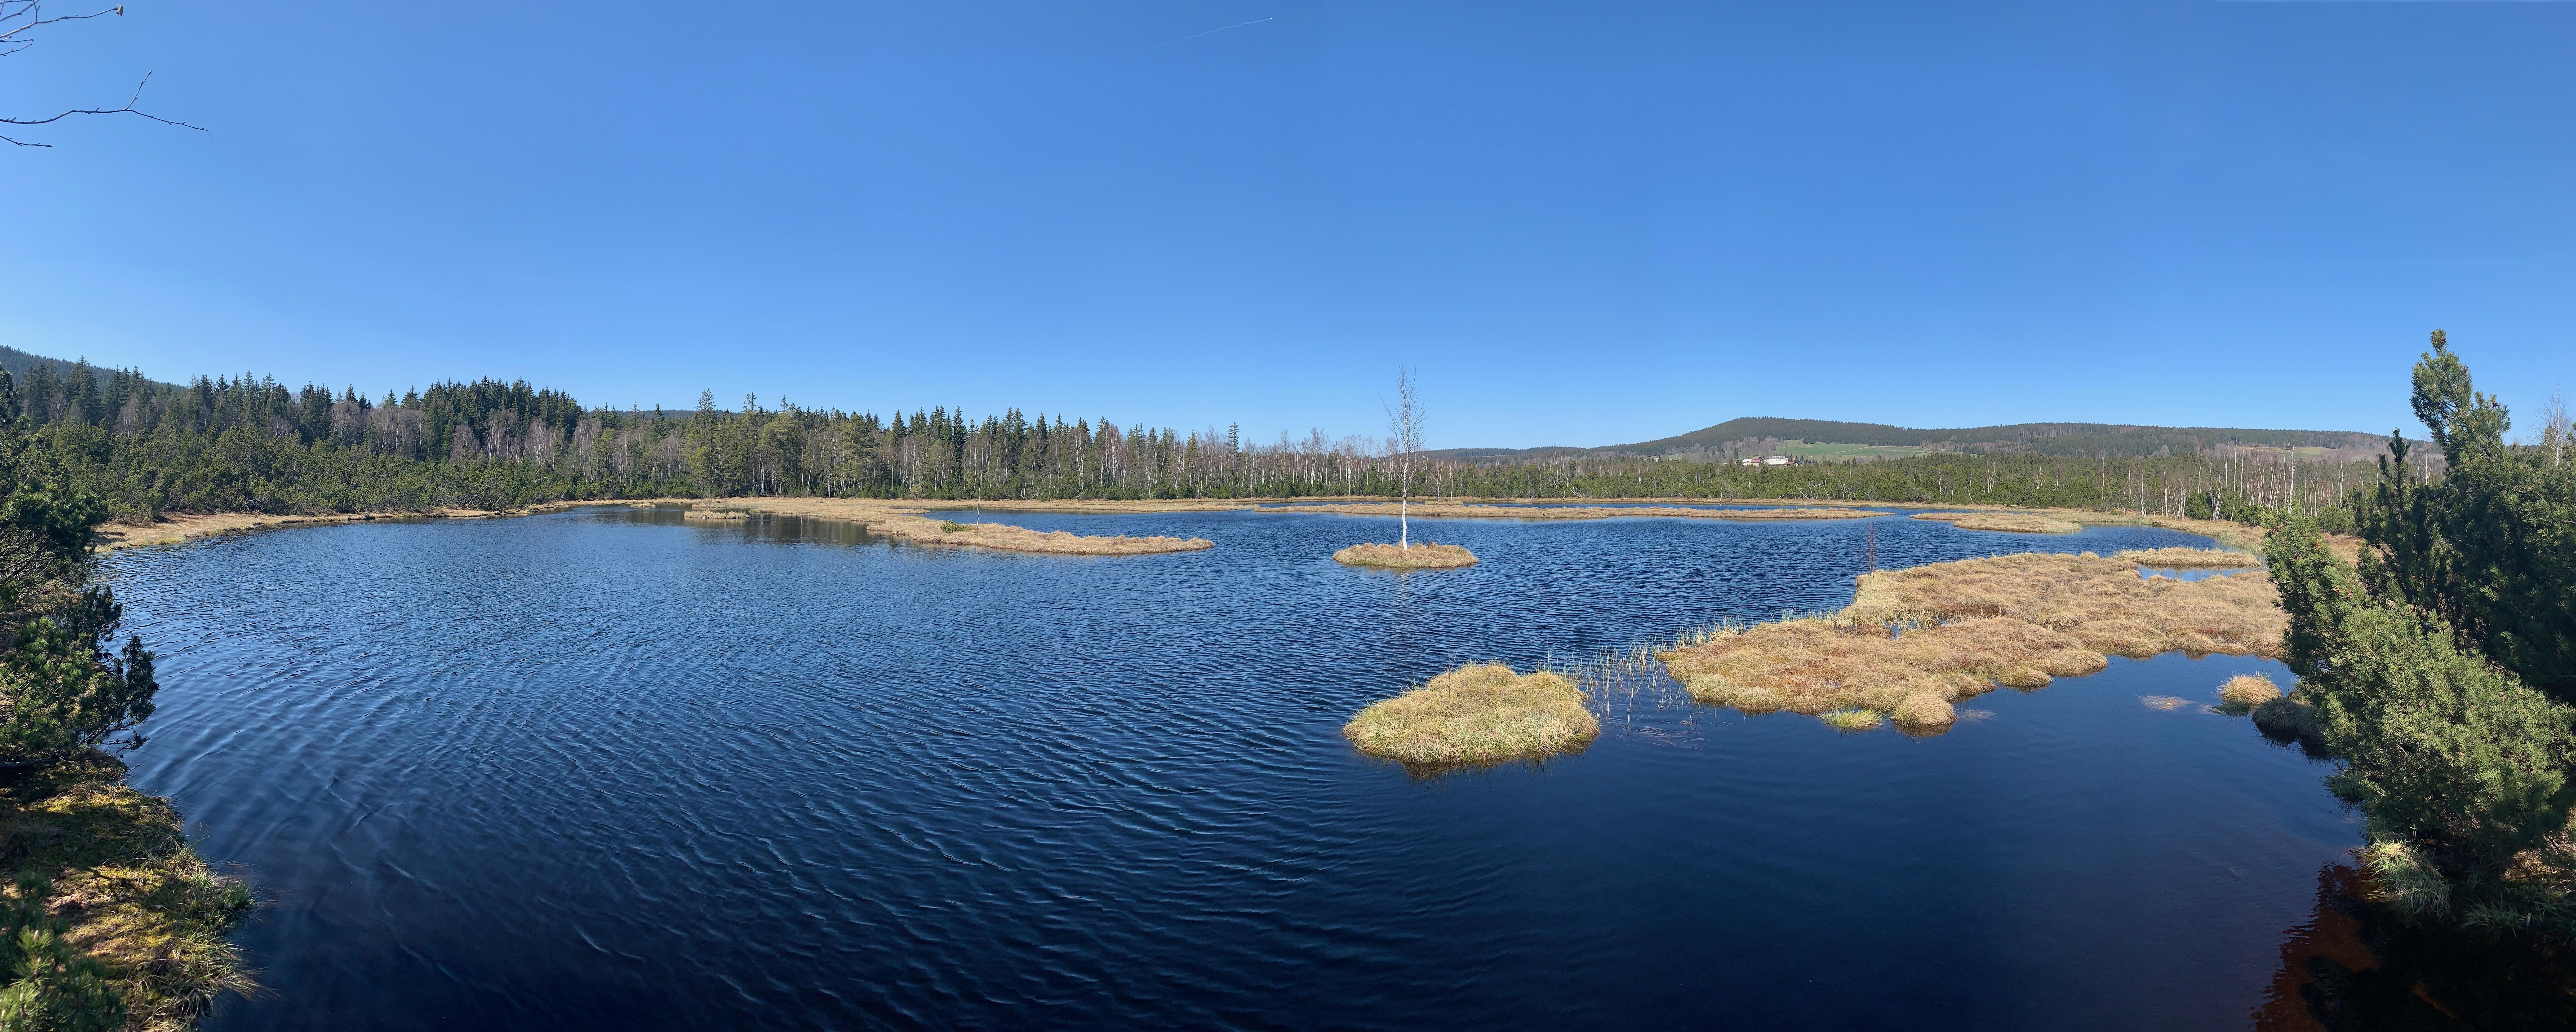 Moorsee in Tschechien